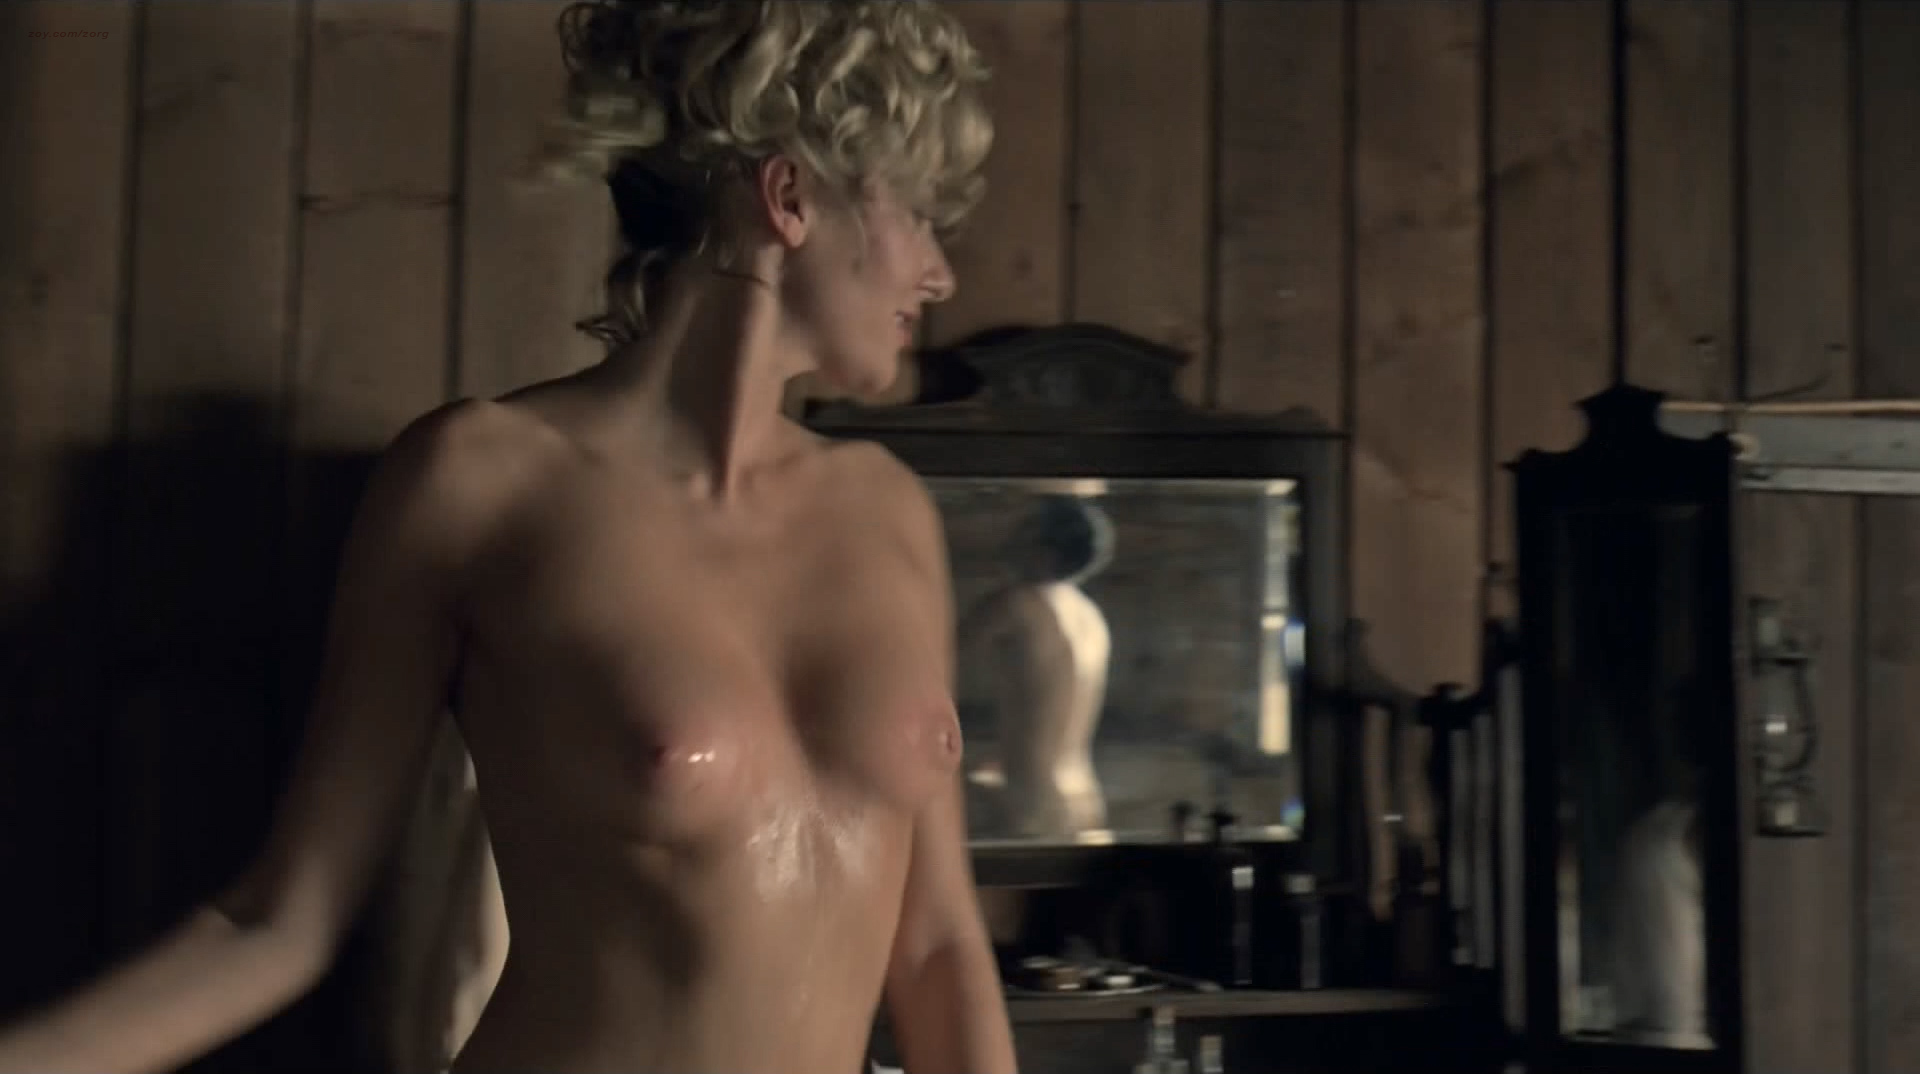 Angela Sarafyan Tits download sex pics evan rachel wood nude topless and butt